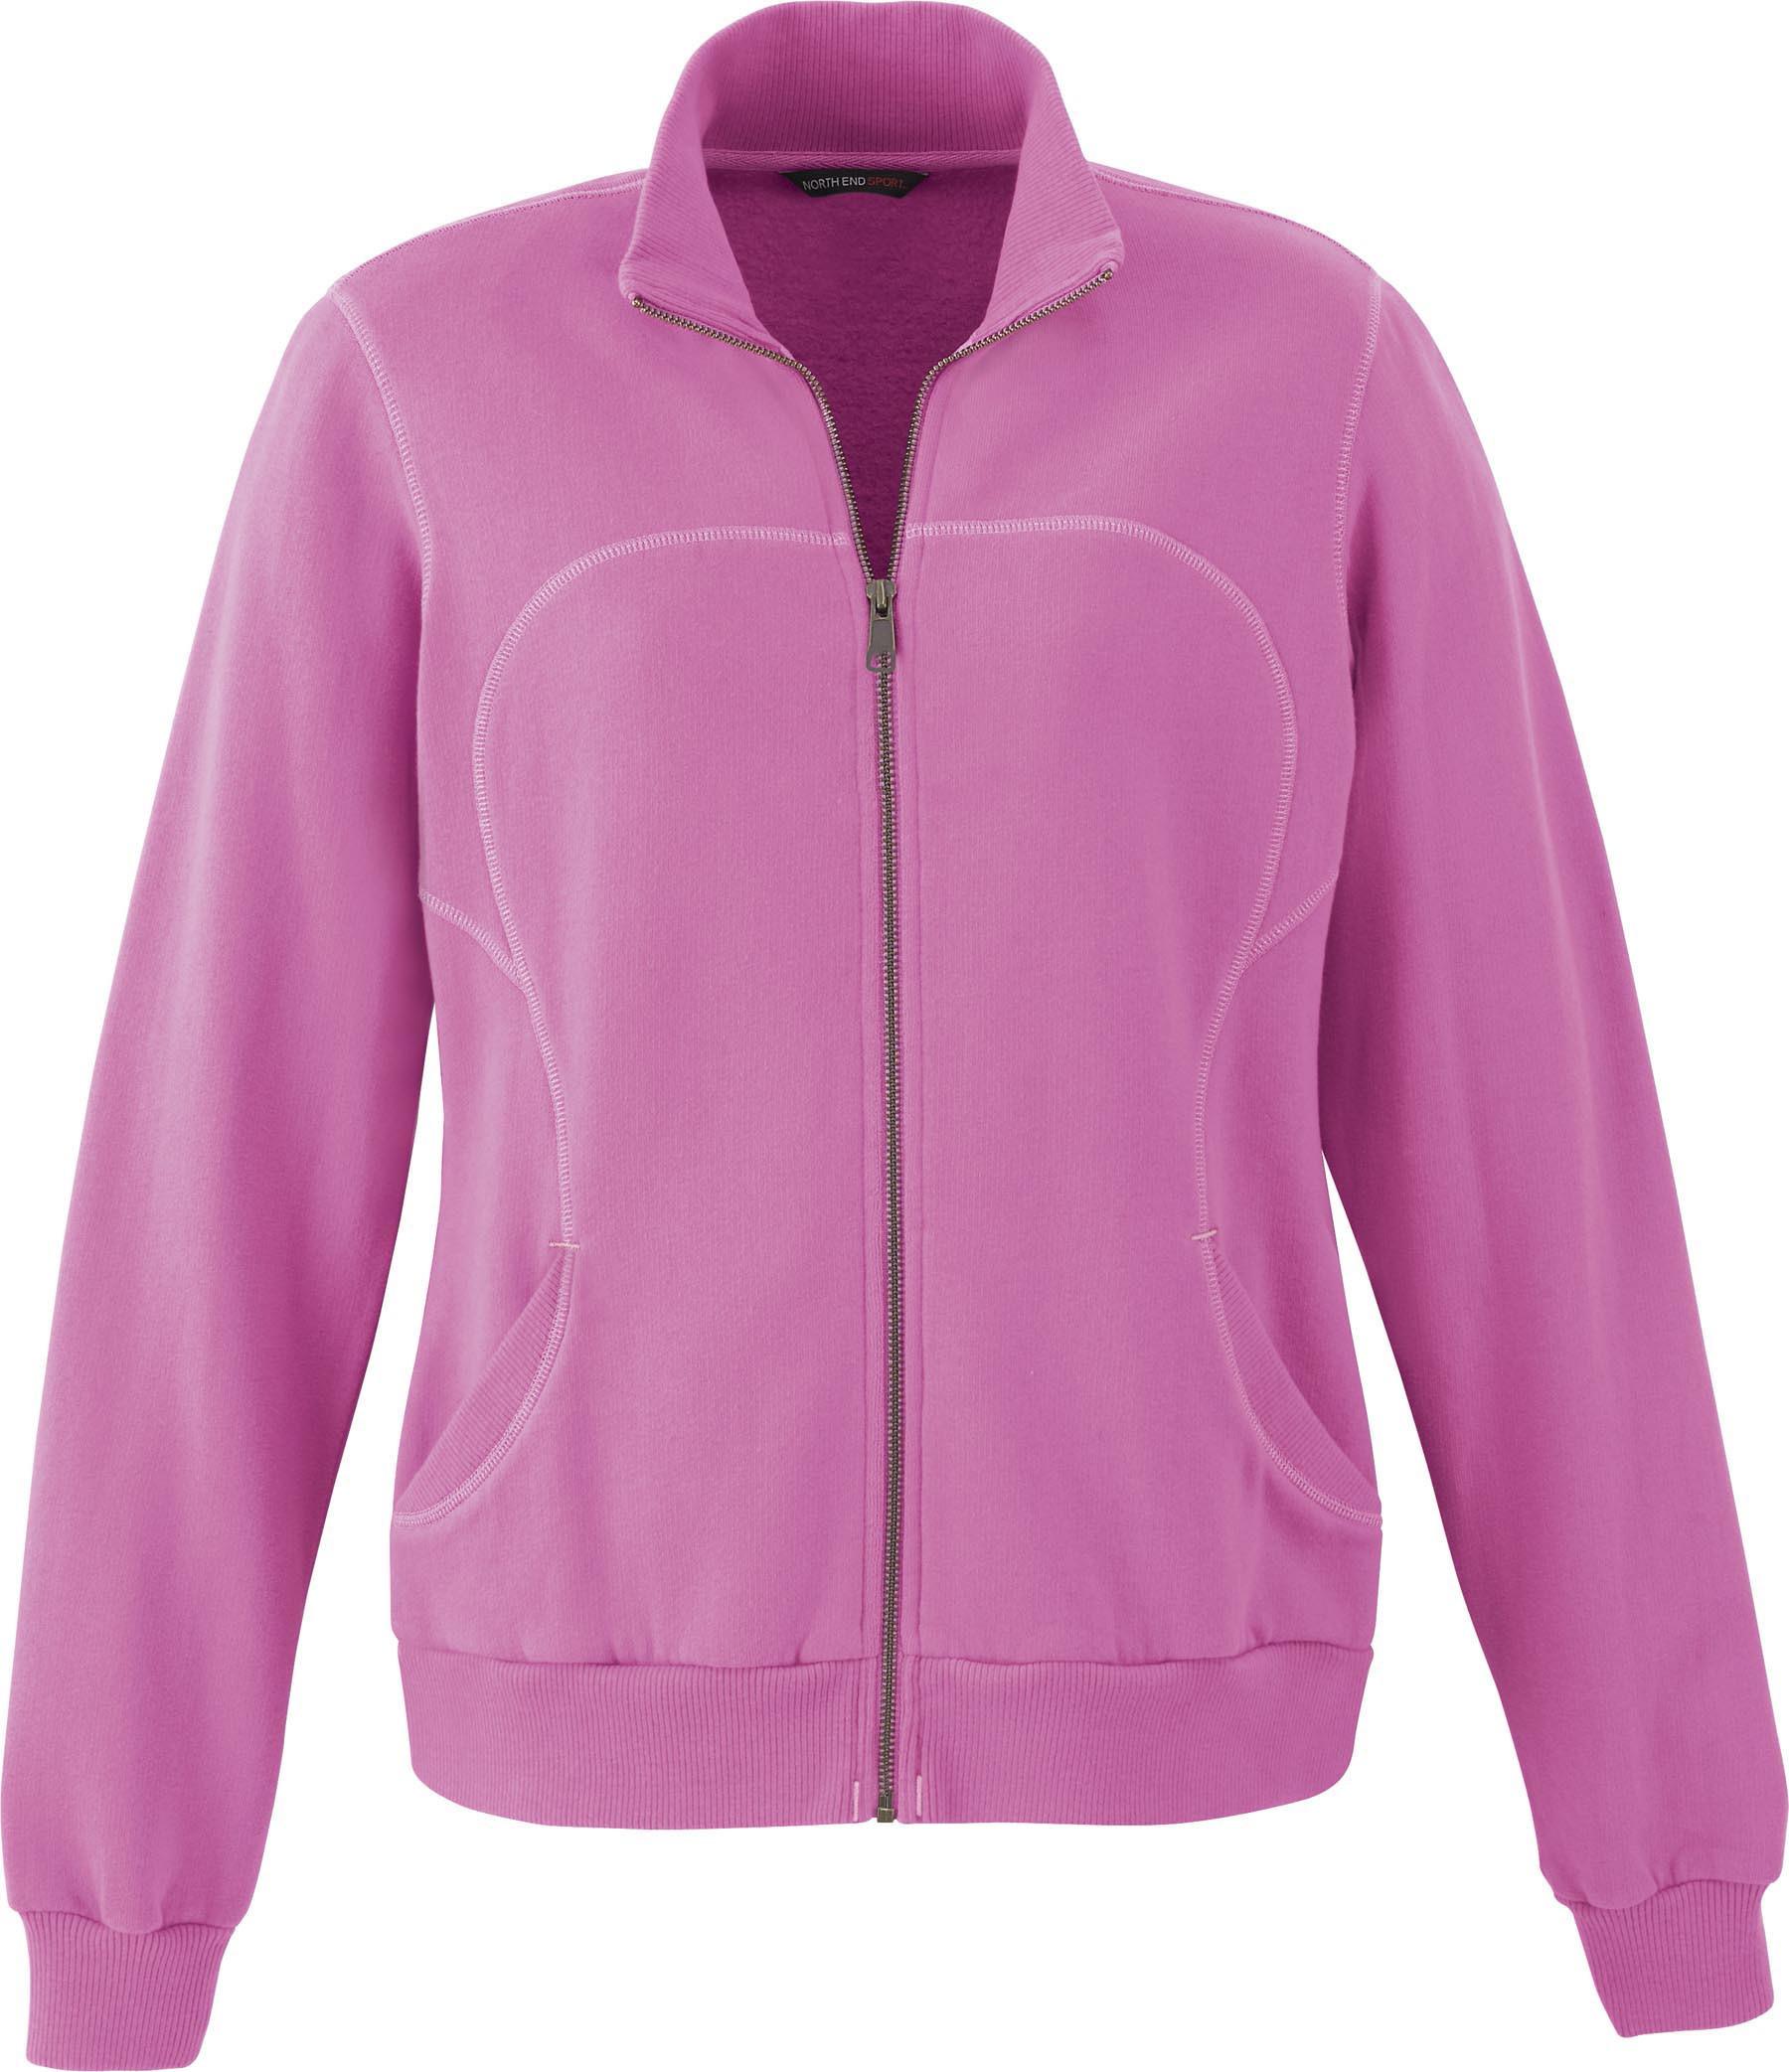 Ash City Cotton/Poly Fleece 78642 - Ladies' Cotton Polyester Fleece Zip Jacket